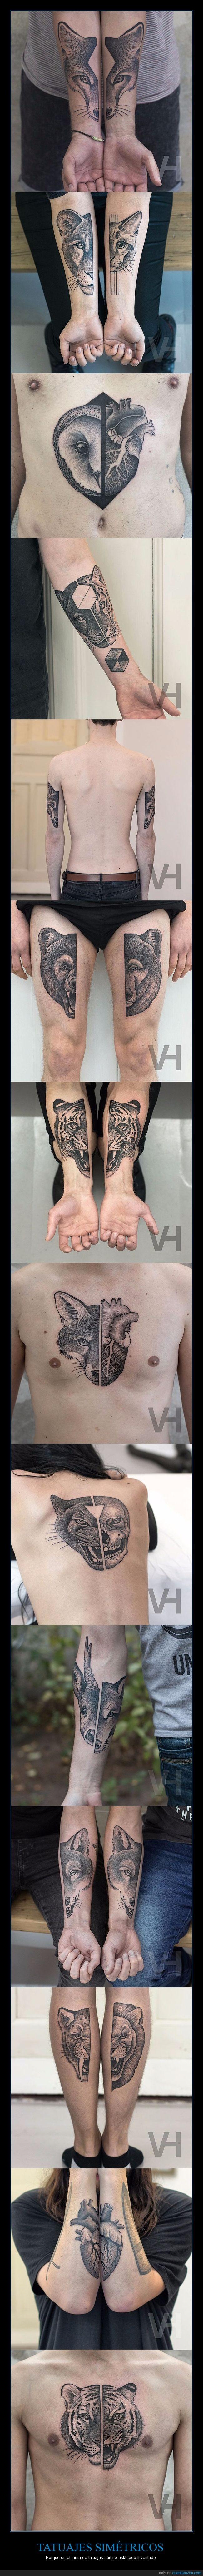 simetría,simétricos,tatuajes